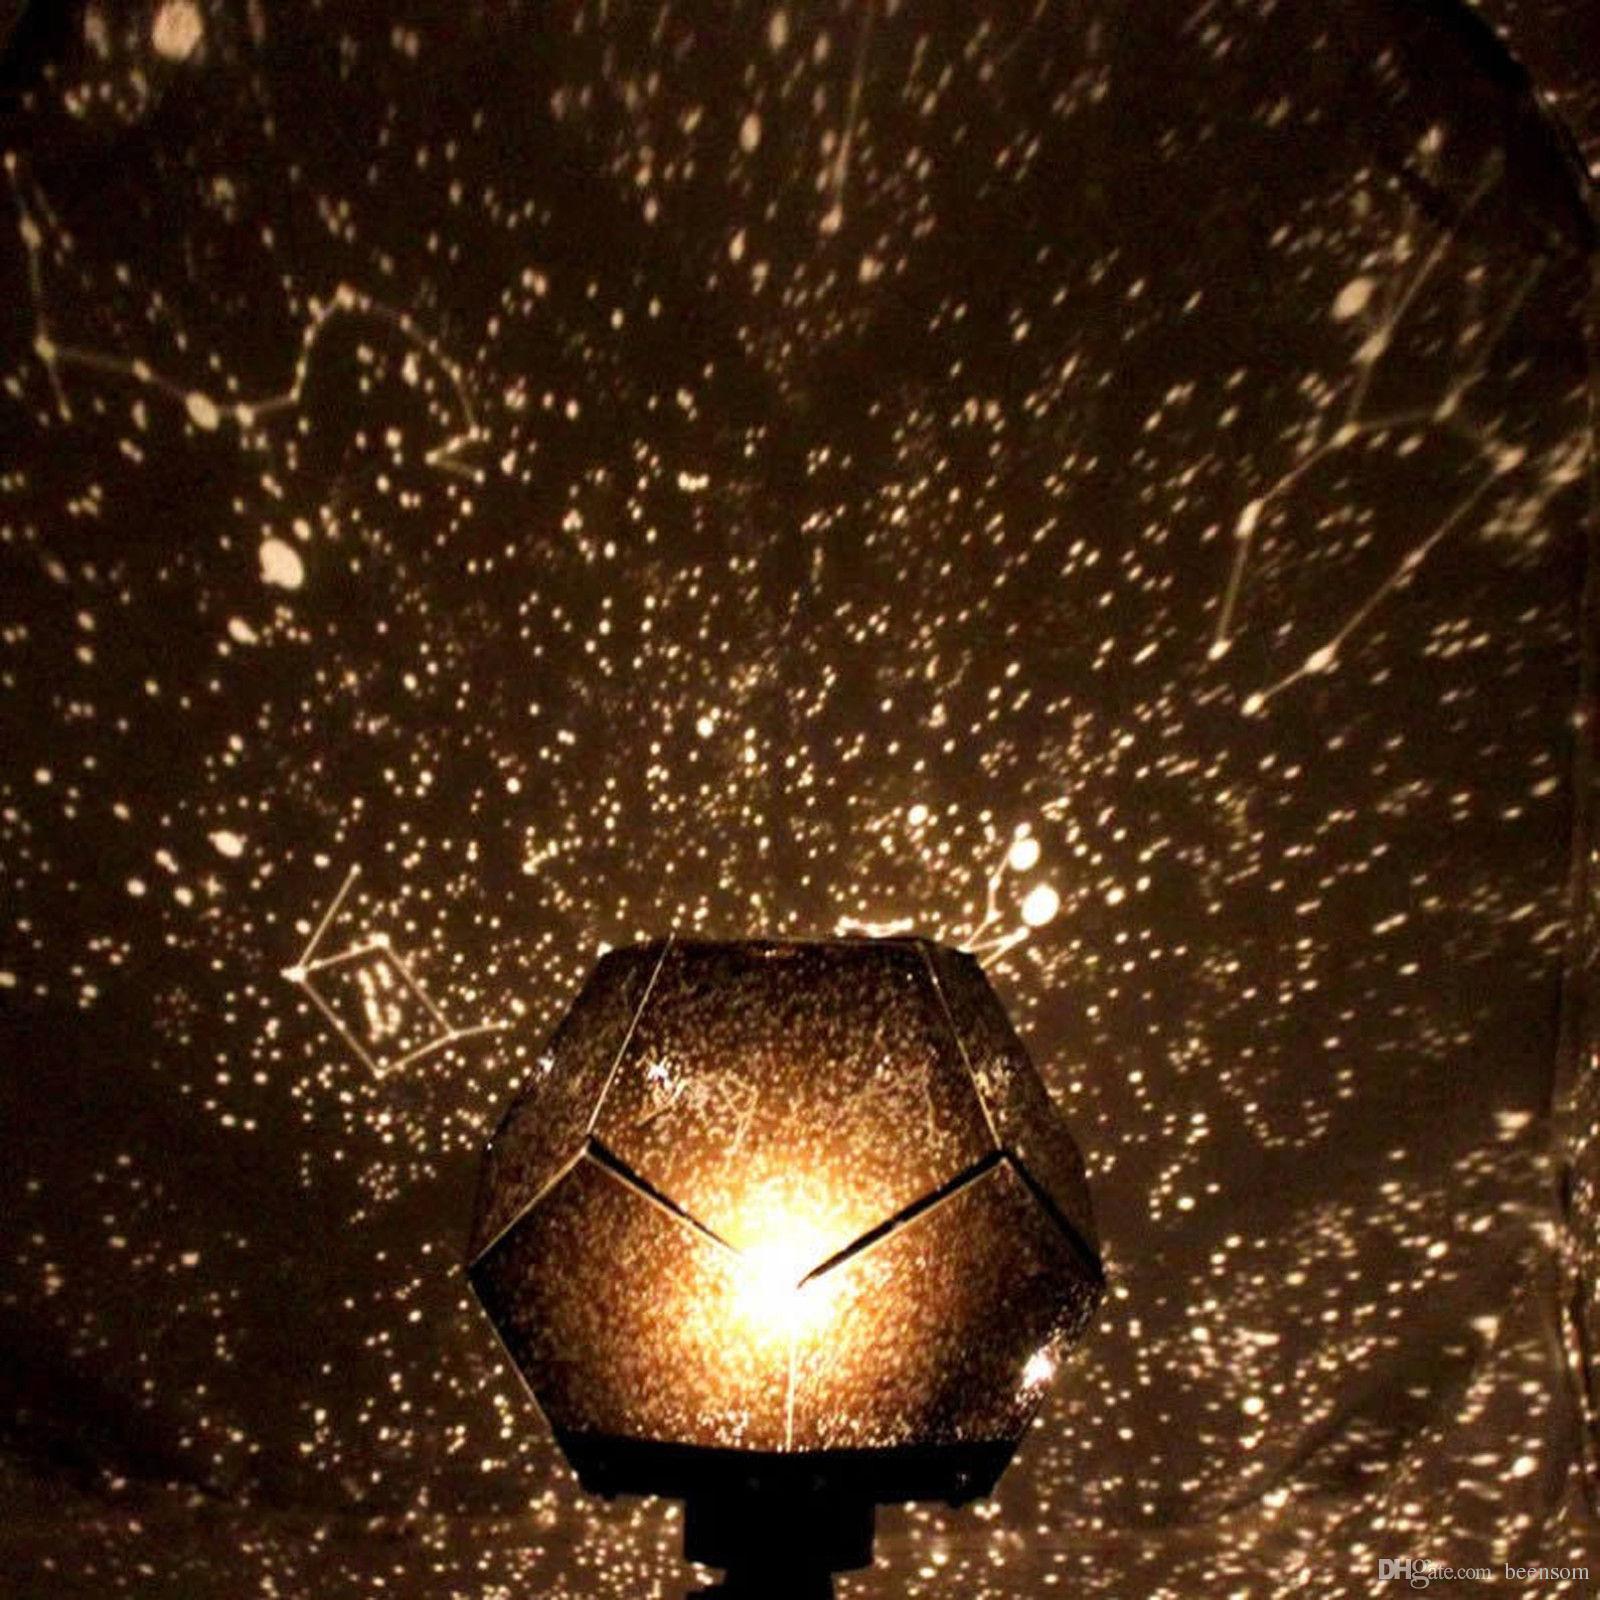 2019 Hot Popular Diy Planetarium Led Night Light Star Celestial Projector Lamp Night Sky Light For Romantic Party Gift From Beensom 20 49